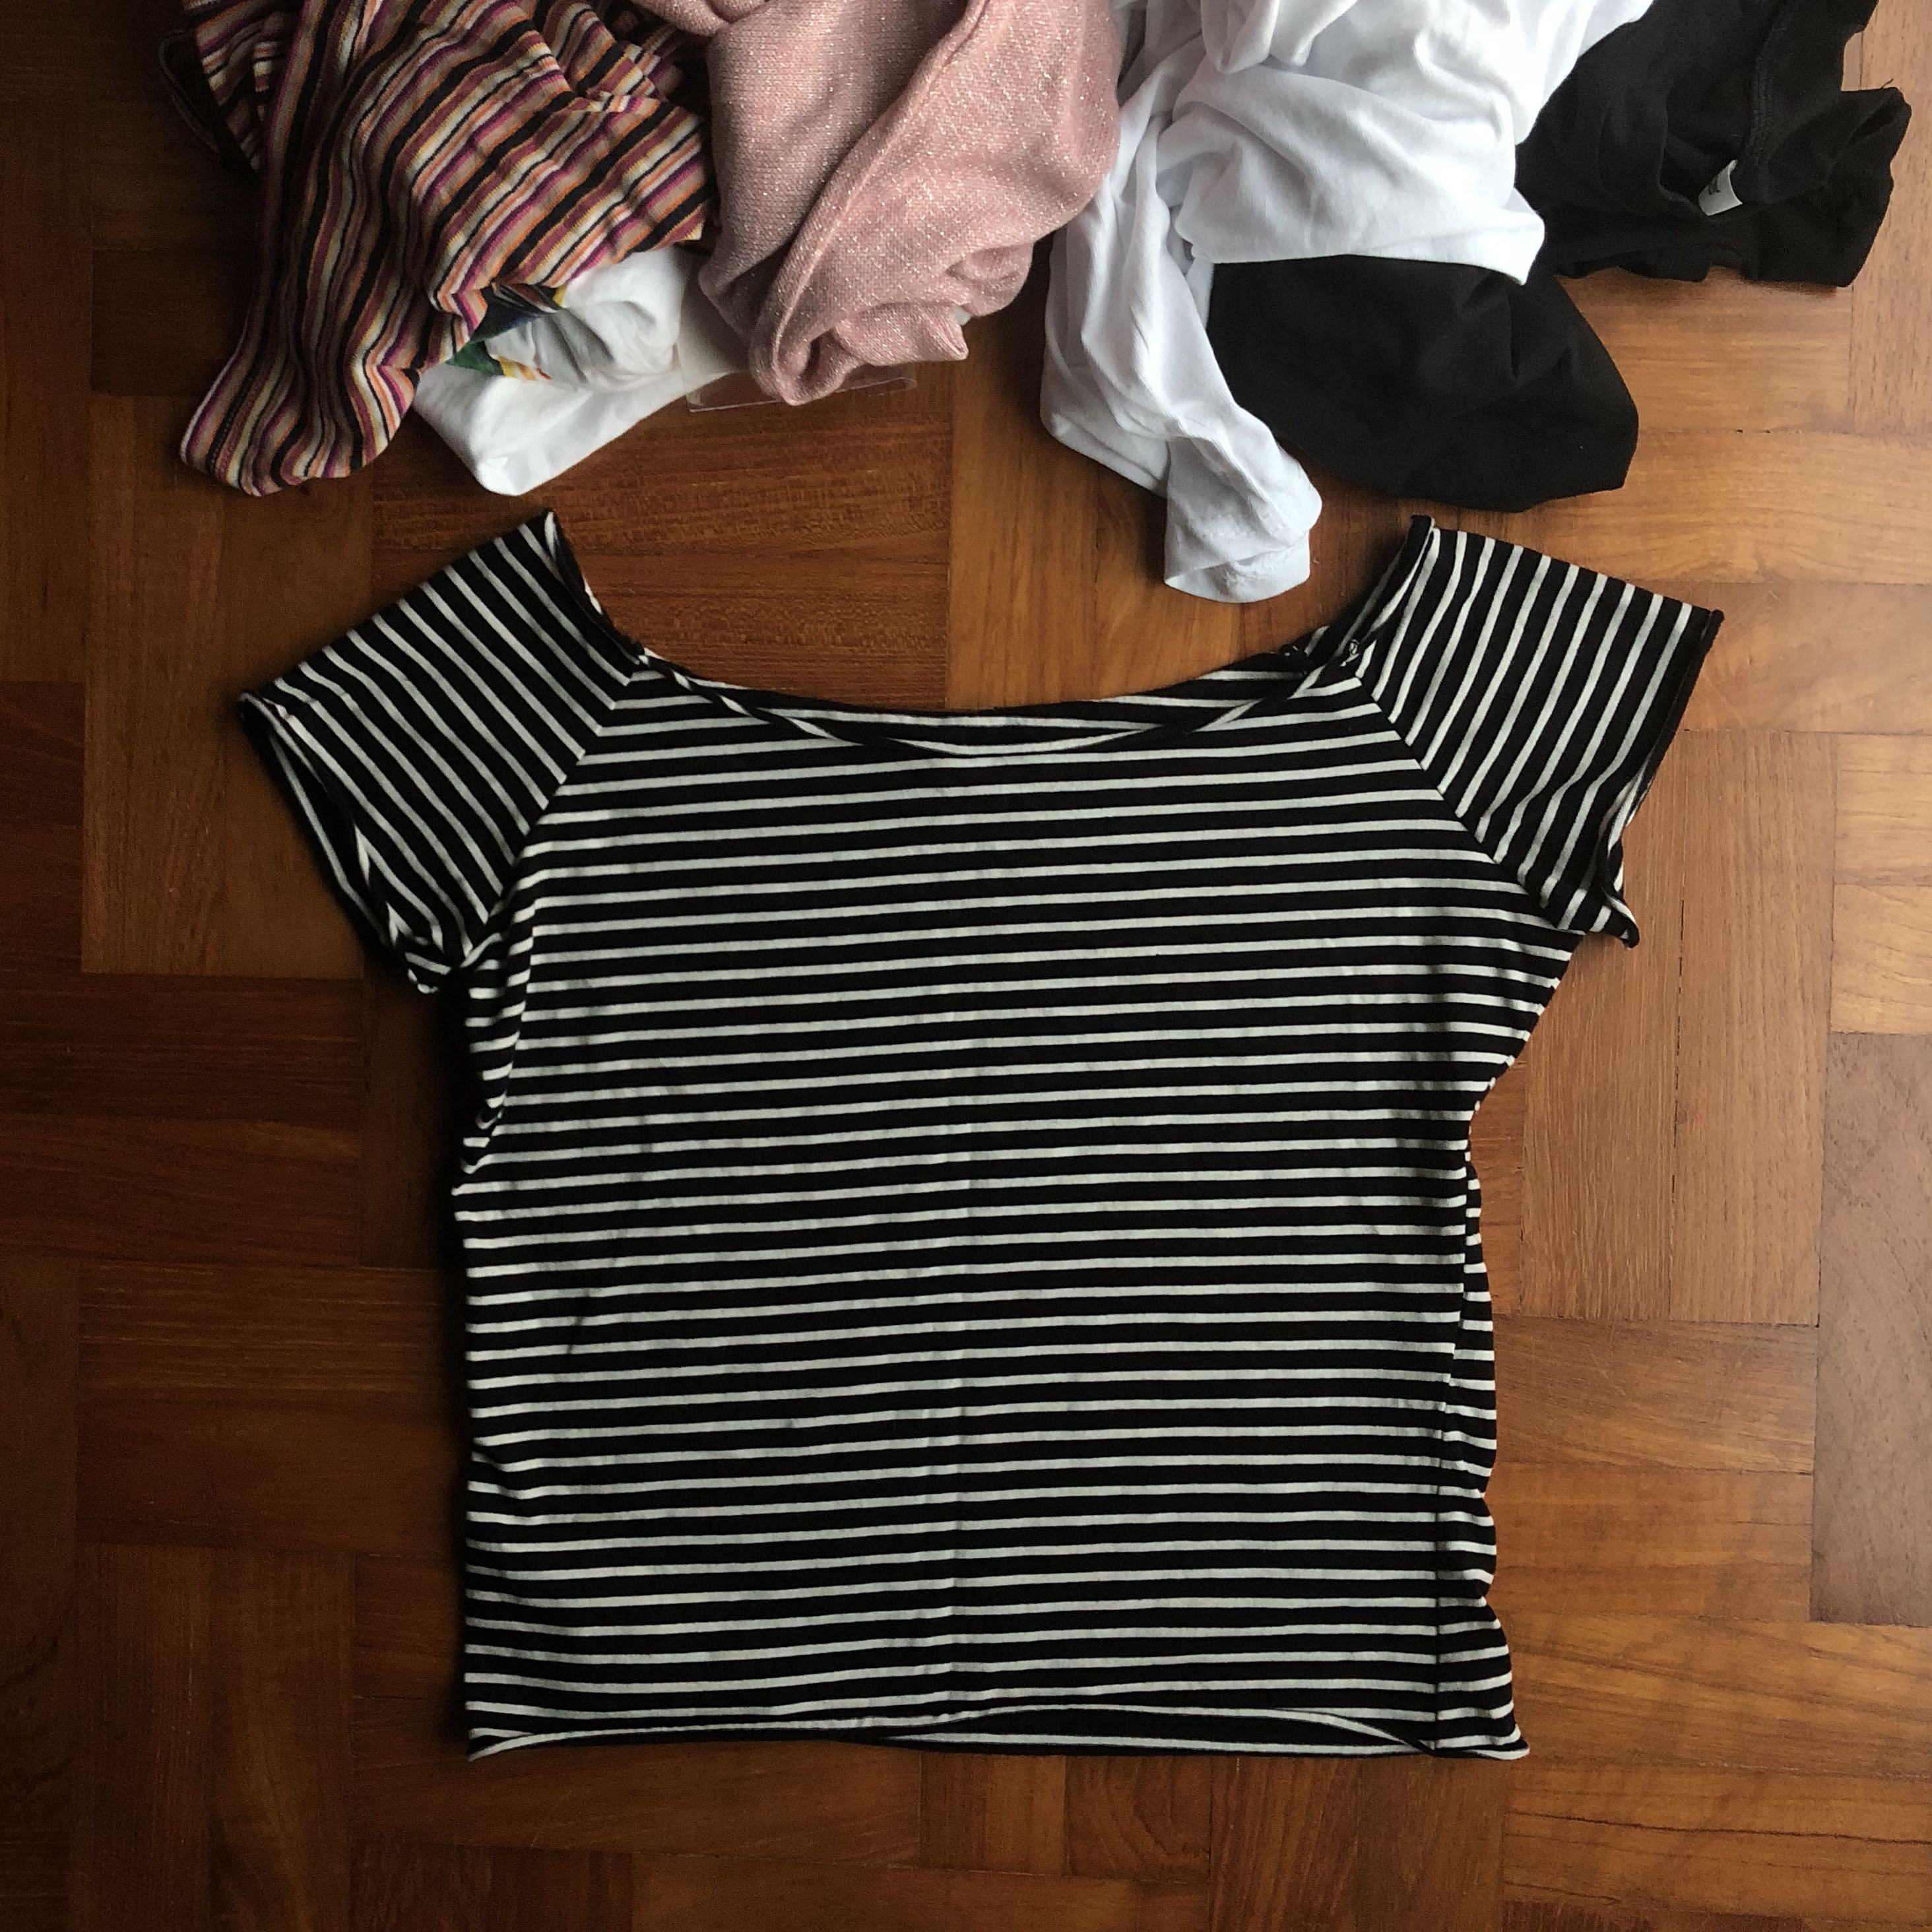 98bf43427d Brandy Melville Black And White Striped Shirt Dress